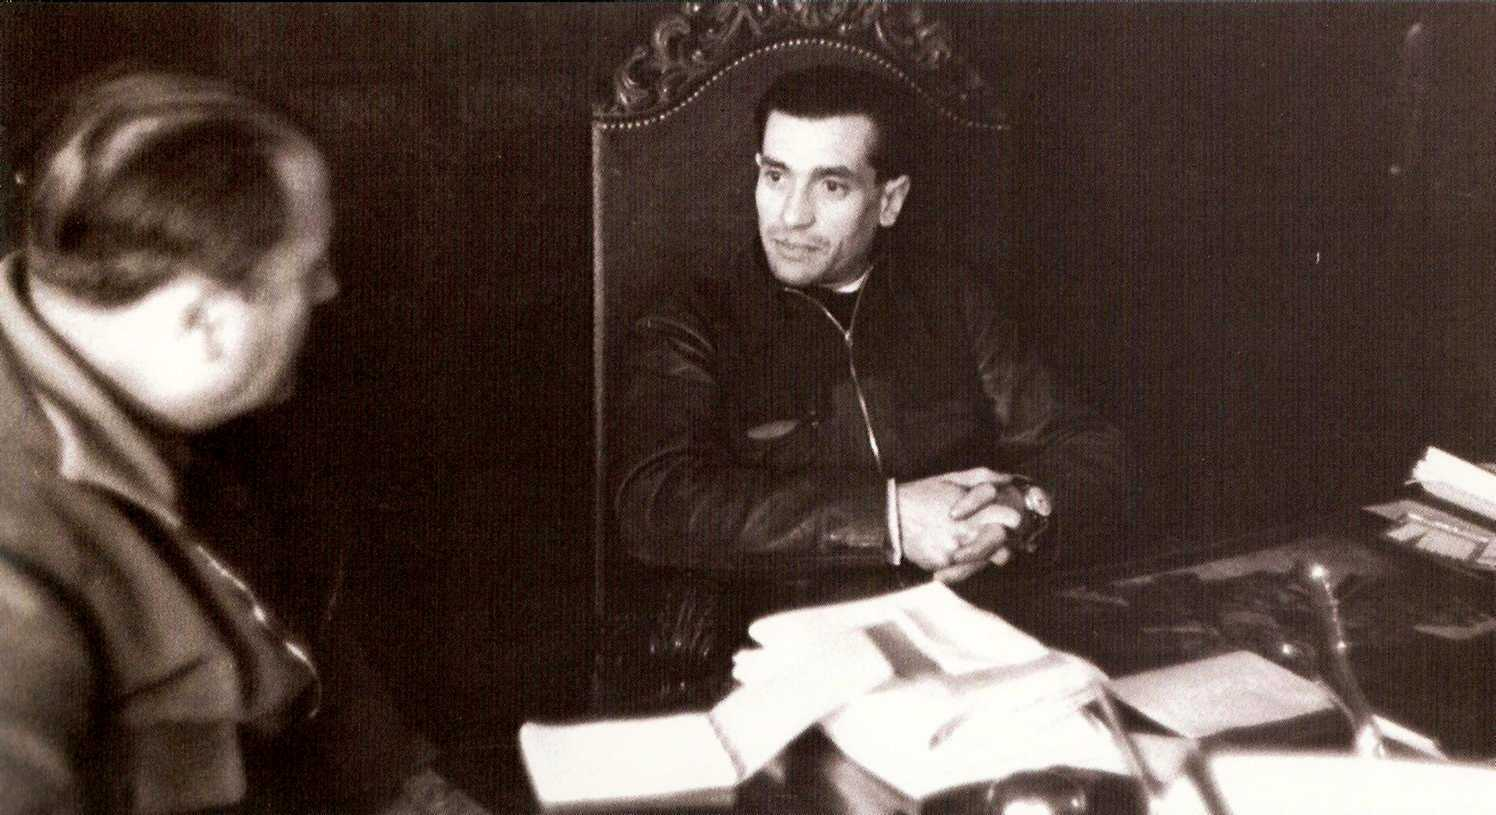 Joaquín Ascaso Budría despatxant al seu gabinet del Consell d'Aragó